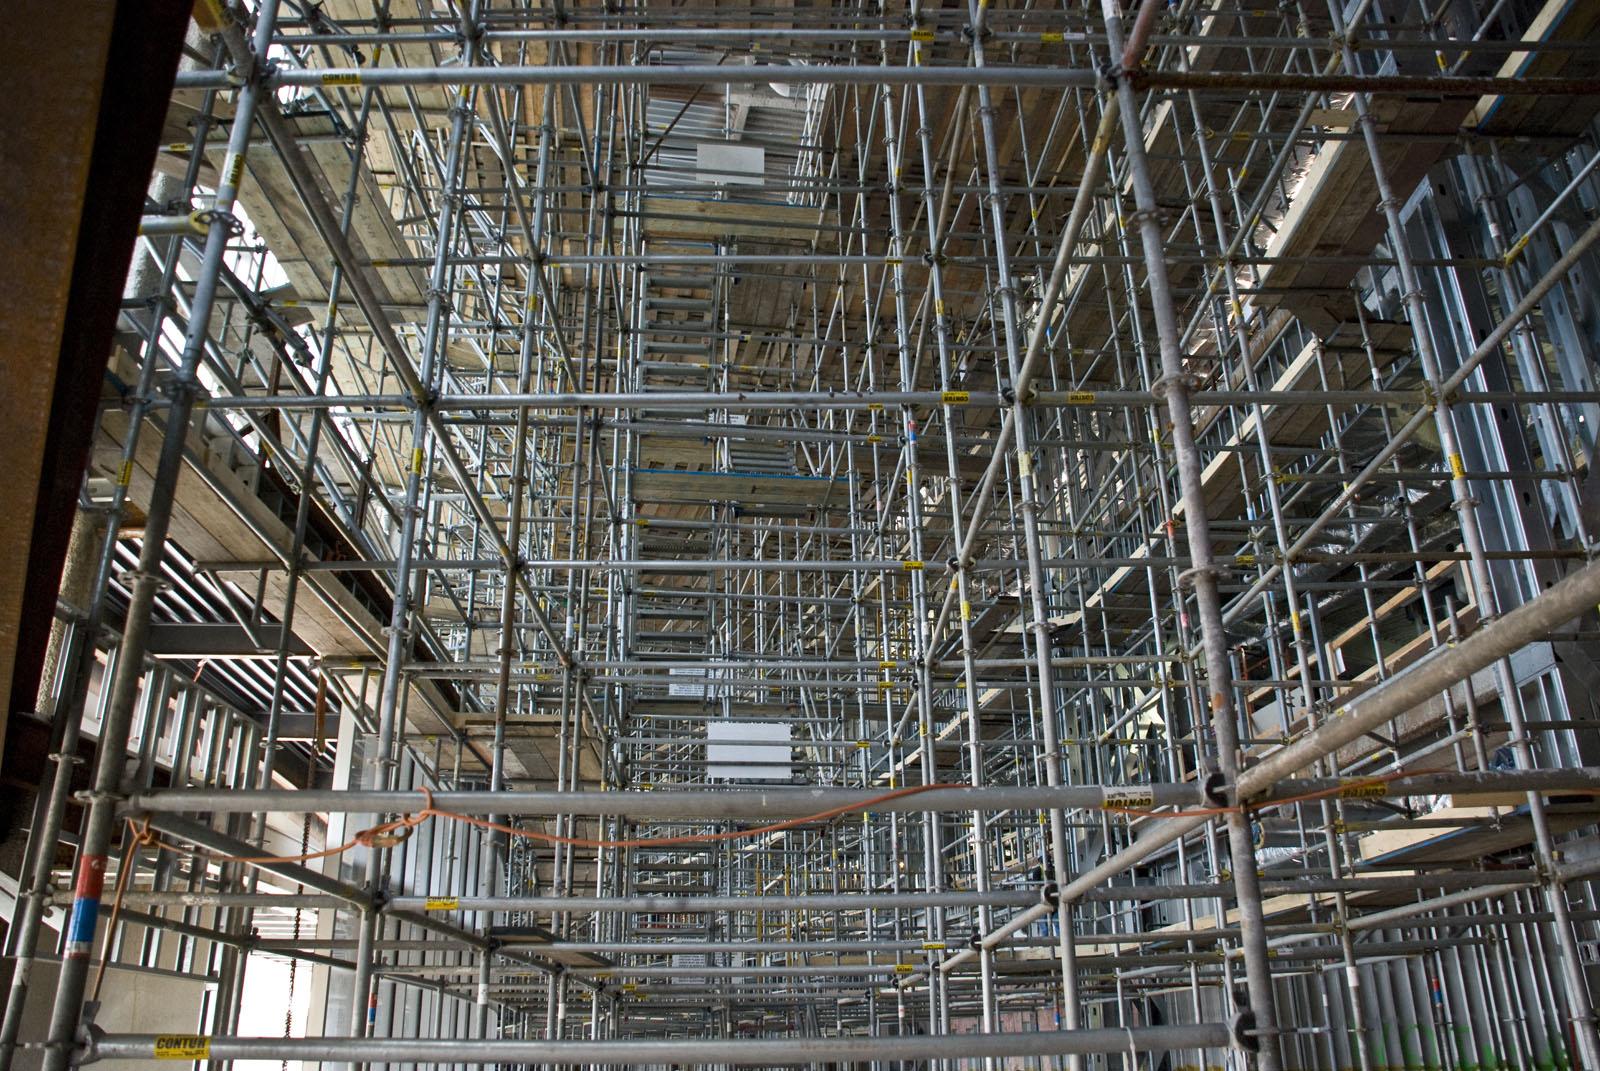 scaffold-rent-scaffolding-superior-scaffold-system-scaffold-atrium-hospital-nj-new-jersey-68